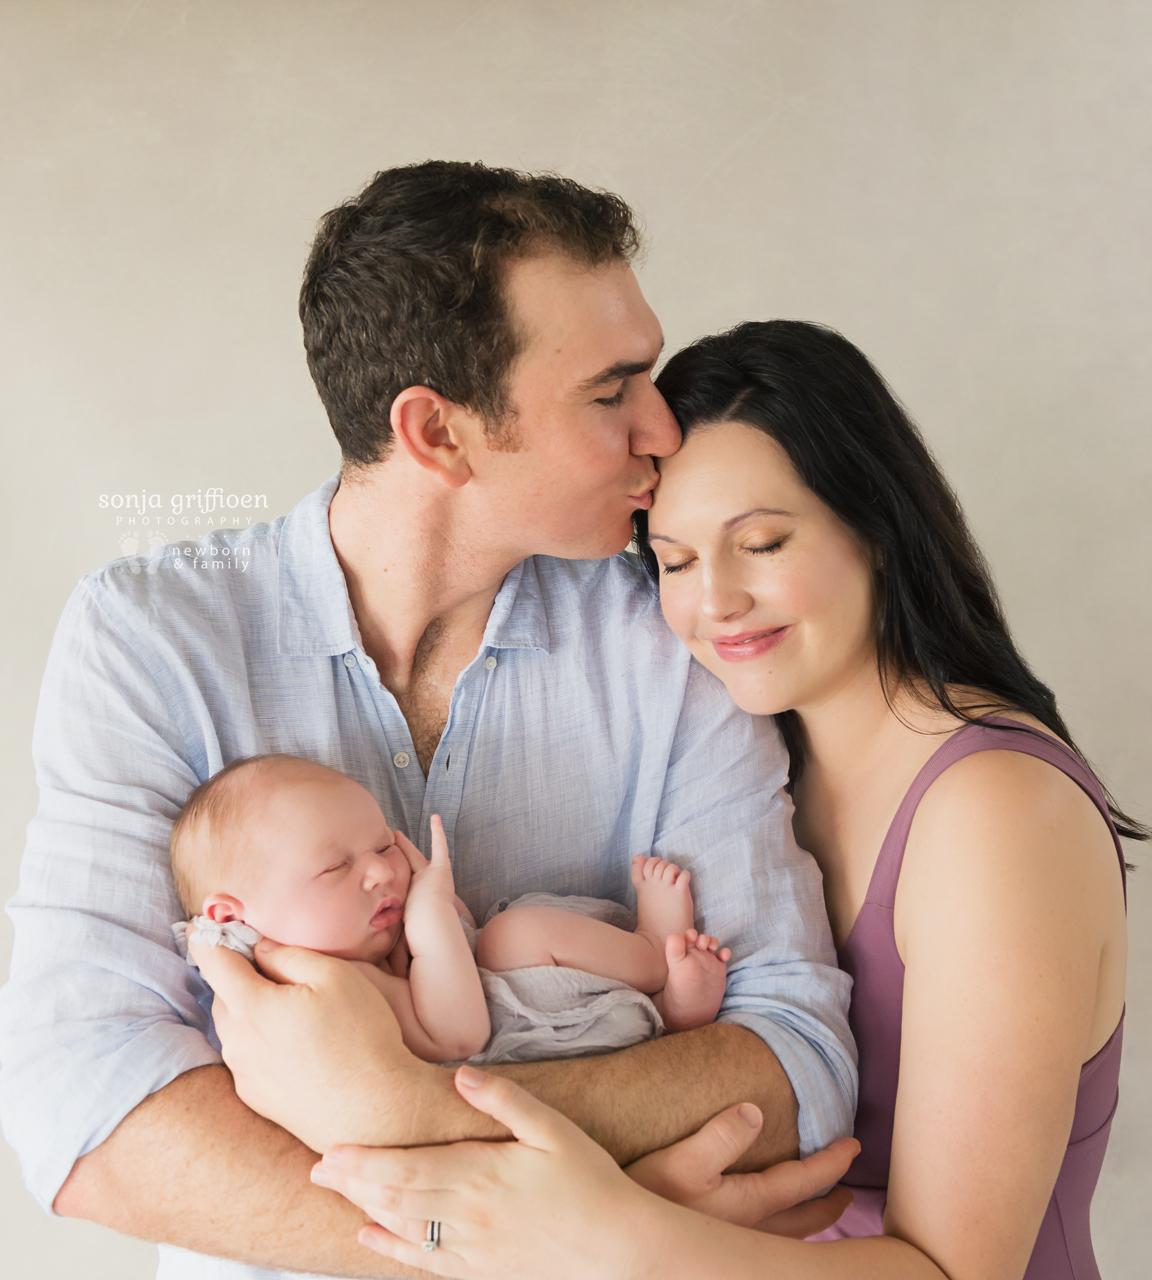 Flynn-Newborn-Brisbane-Newborn-Photographer-Sonja-Griffioen-09.jpg